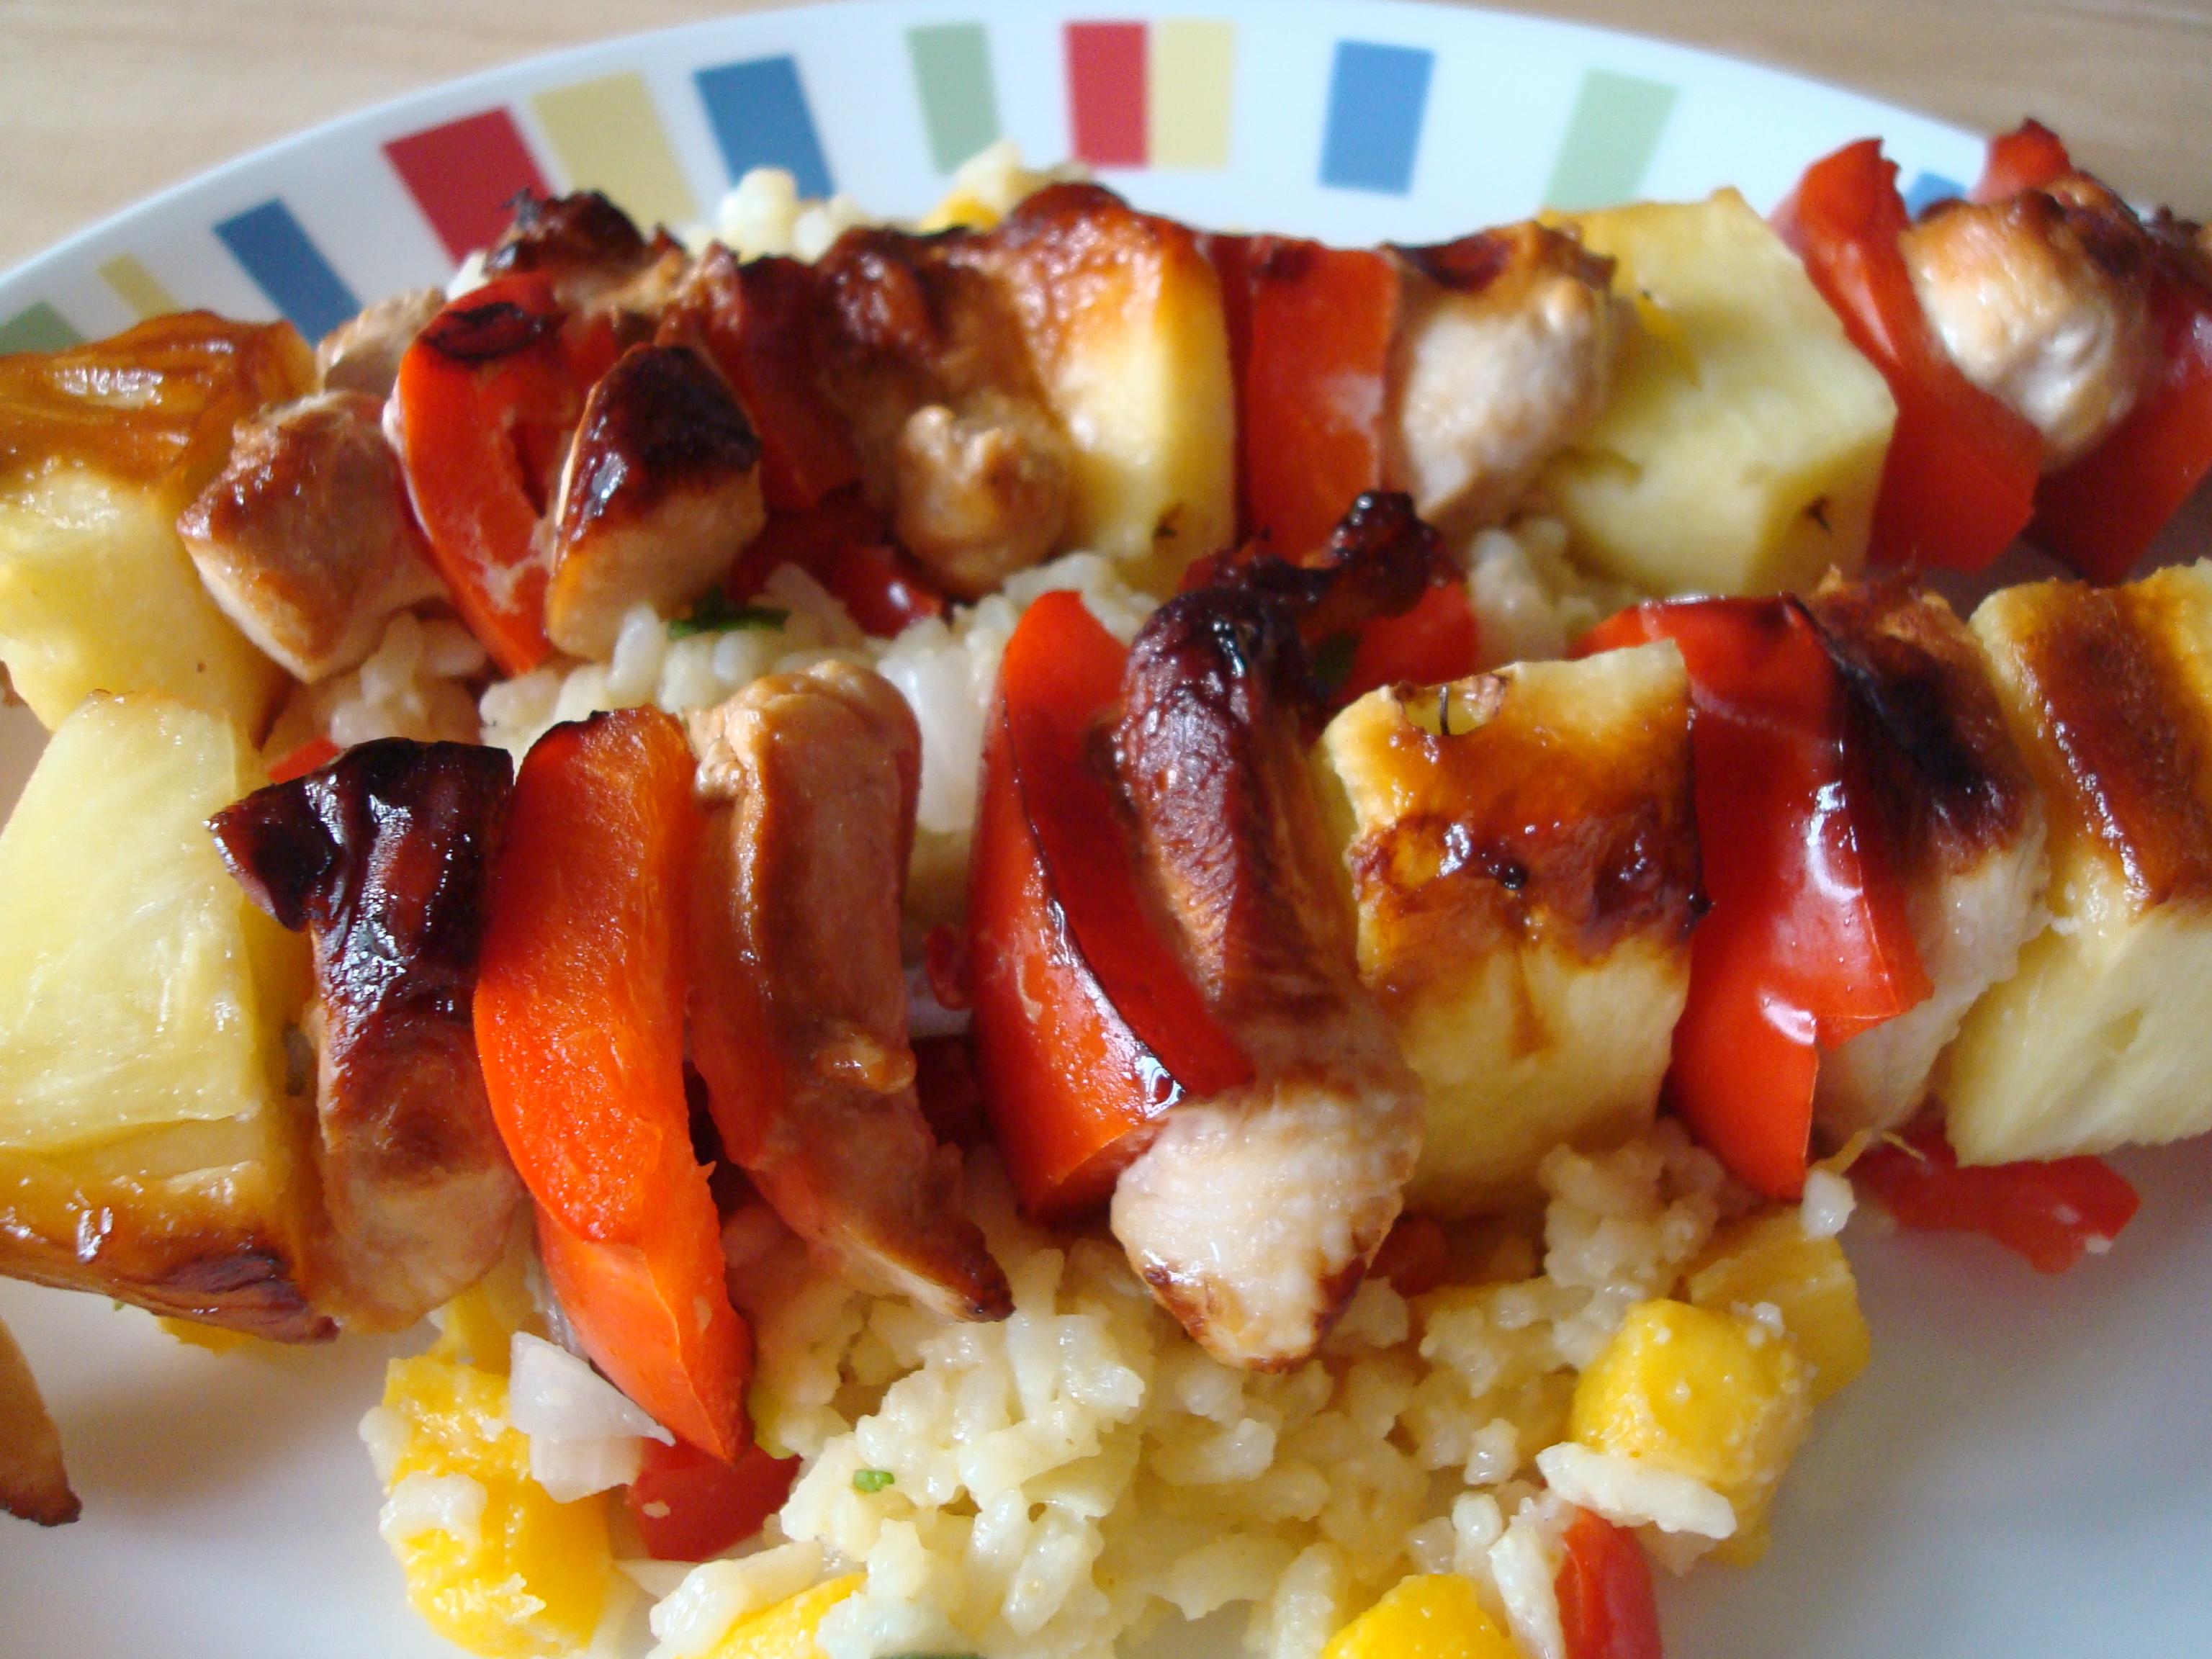 Nif's Grilled Hawaiian Chicken Skewers